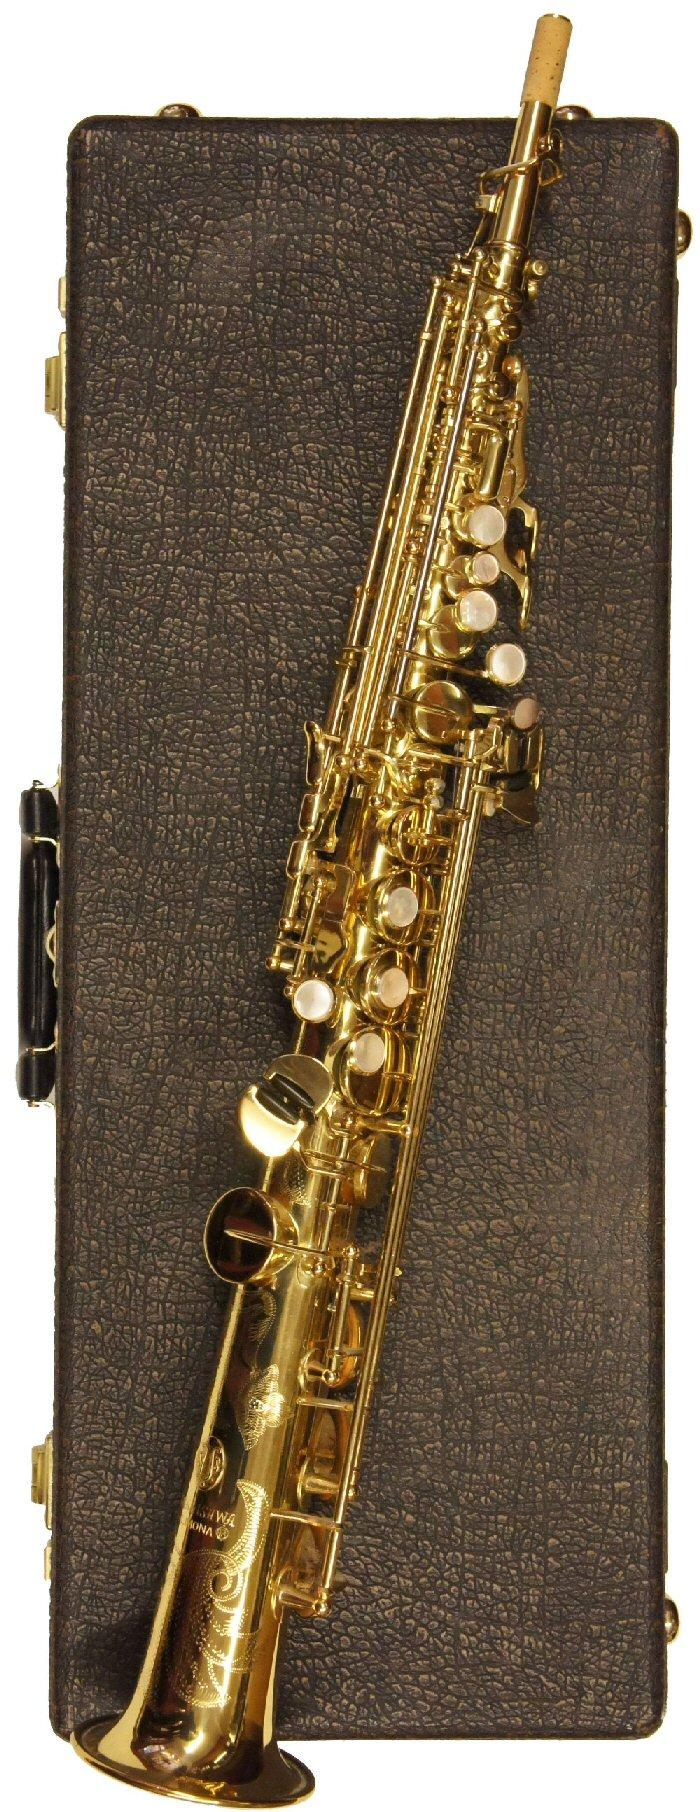 Second Hand Yanagisawa Soprano Sax